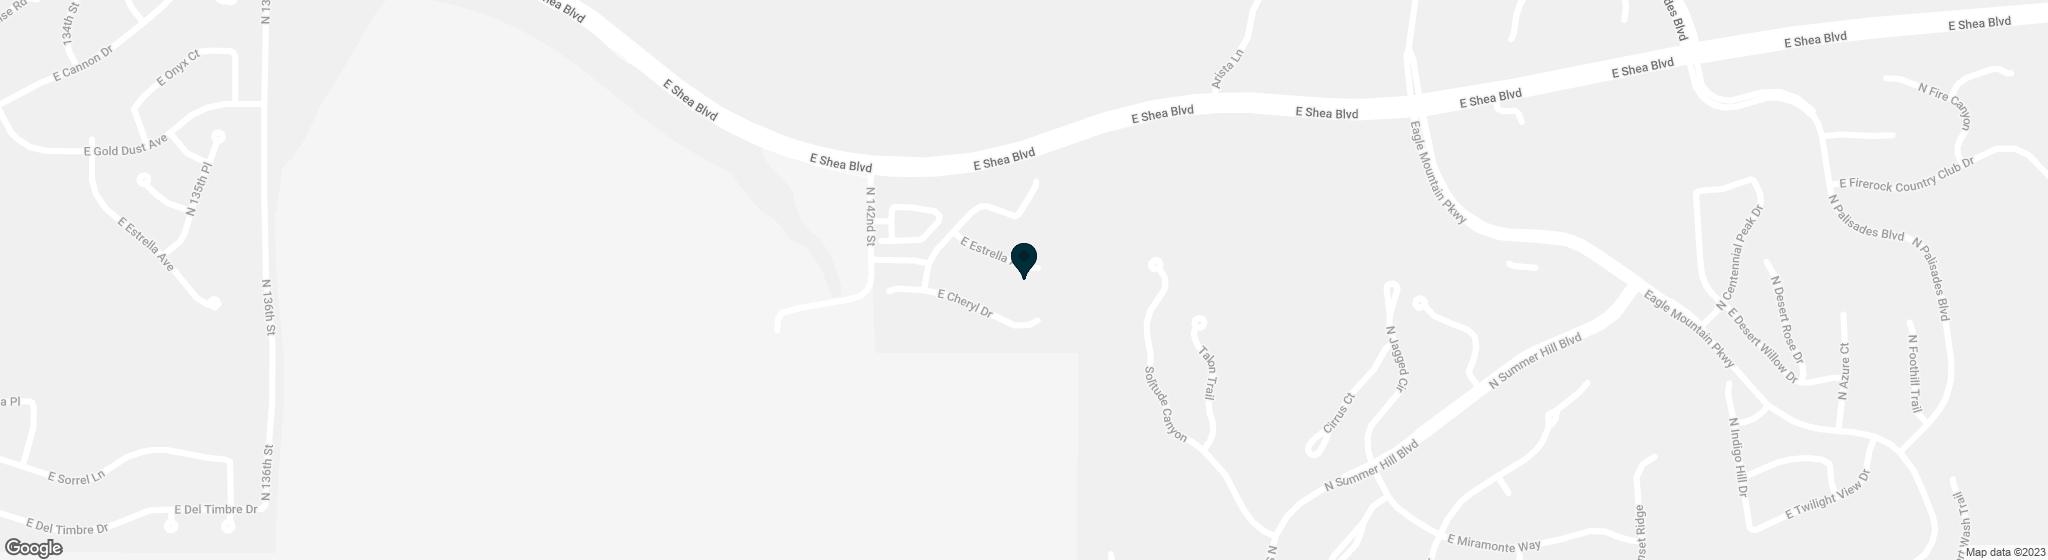 14345 E ESTRELLA Avenue Scottsdale AZ 85259